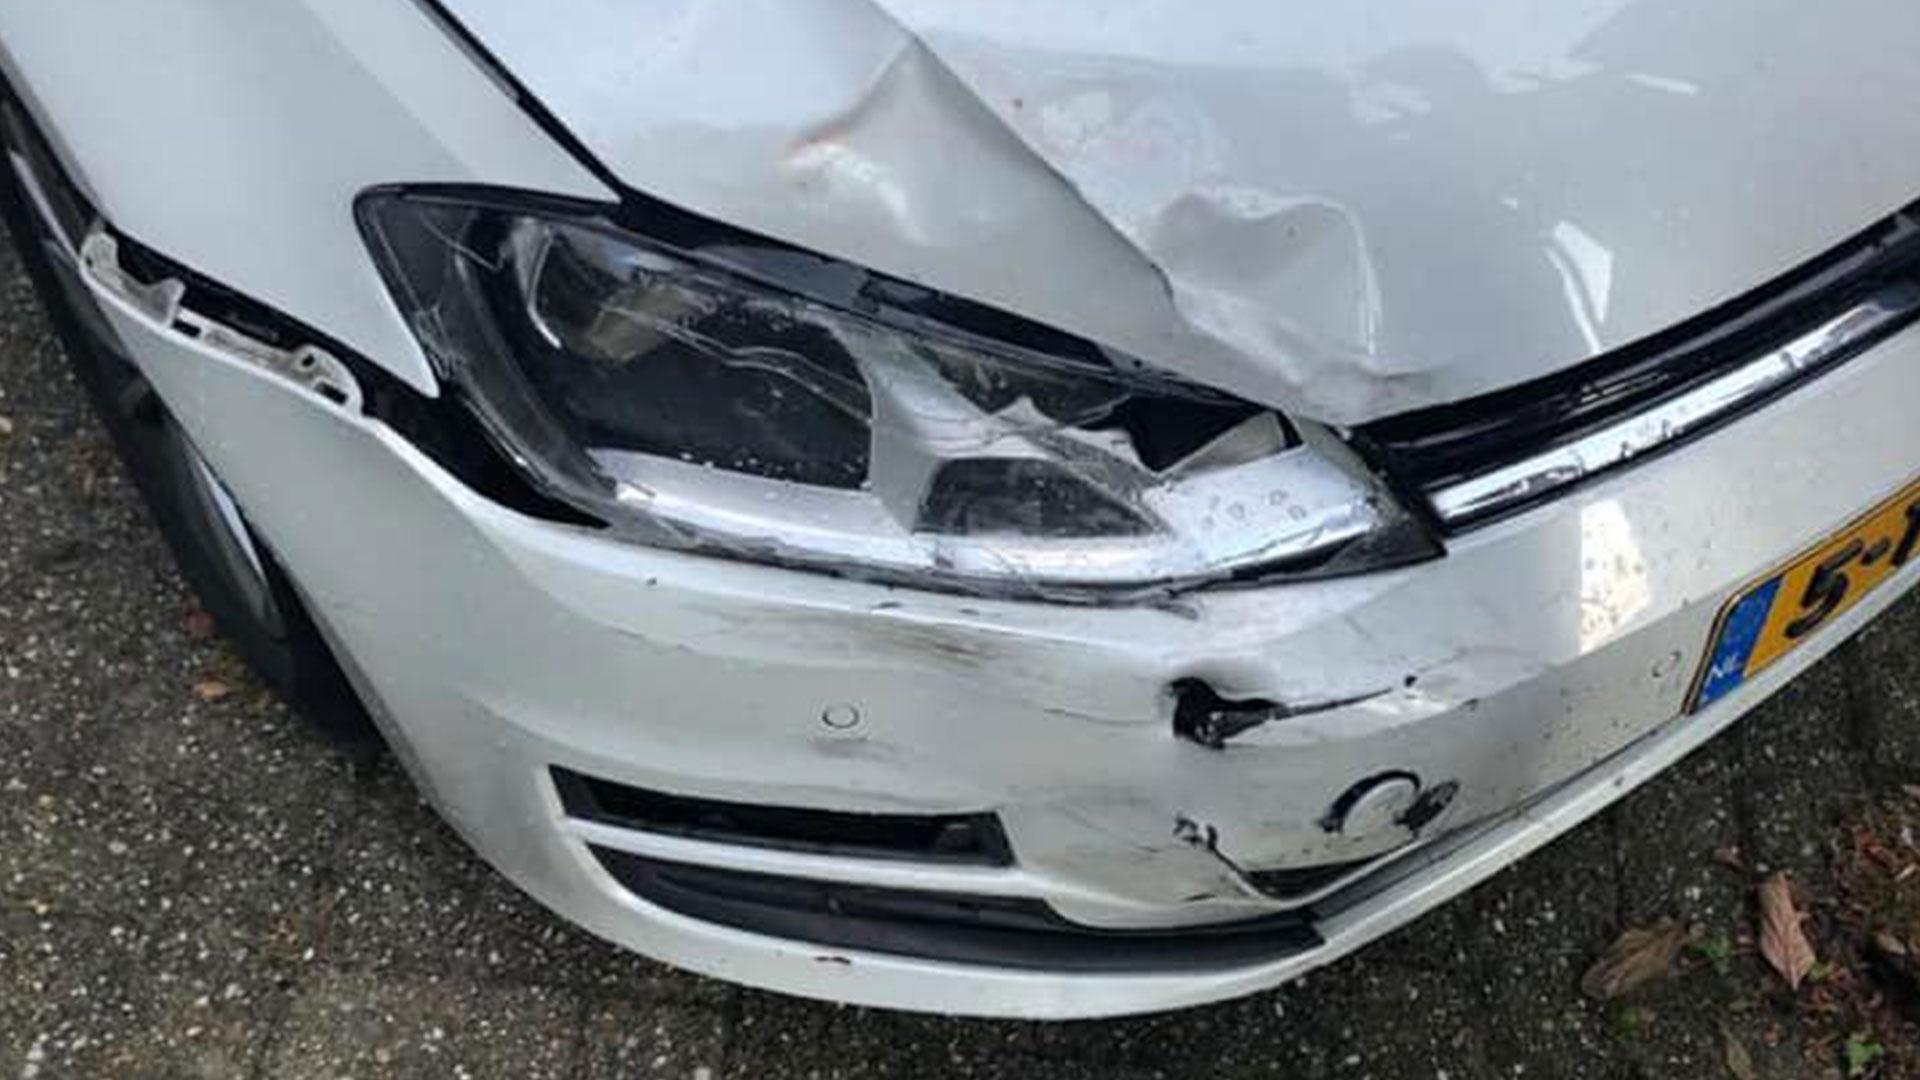 Auto nechala na parkovisku pri letisku. Takto ho našla po návrate!